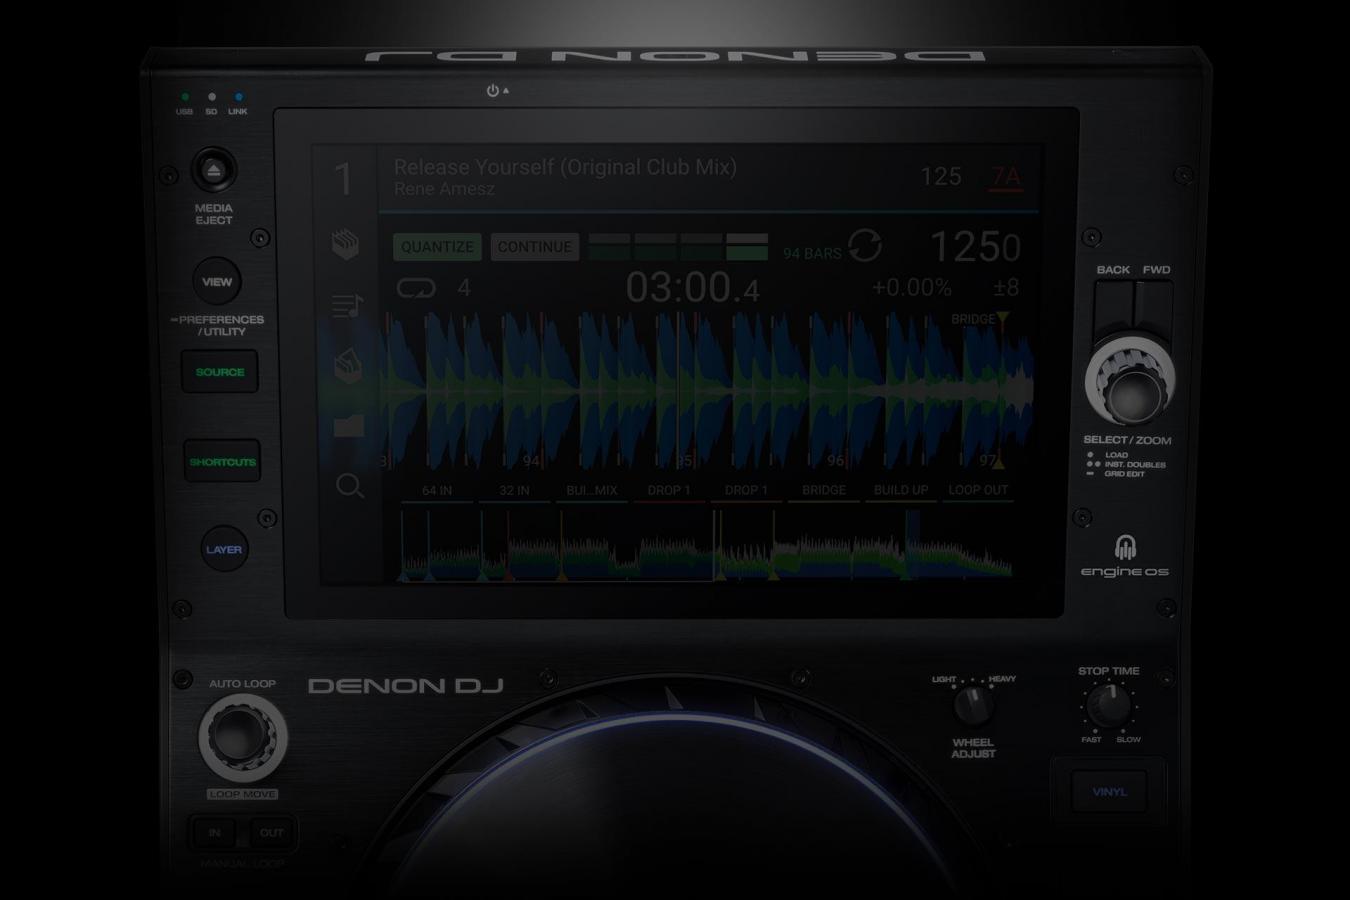 Denon DJ Release New Engine OS Update v1.6